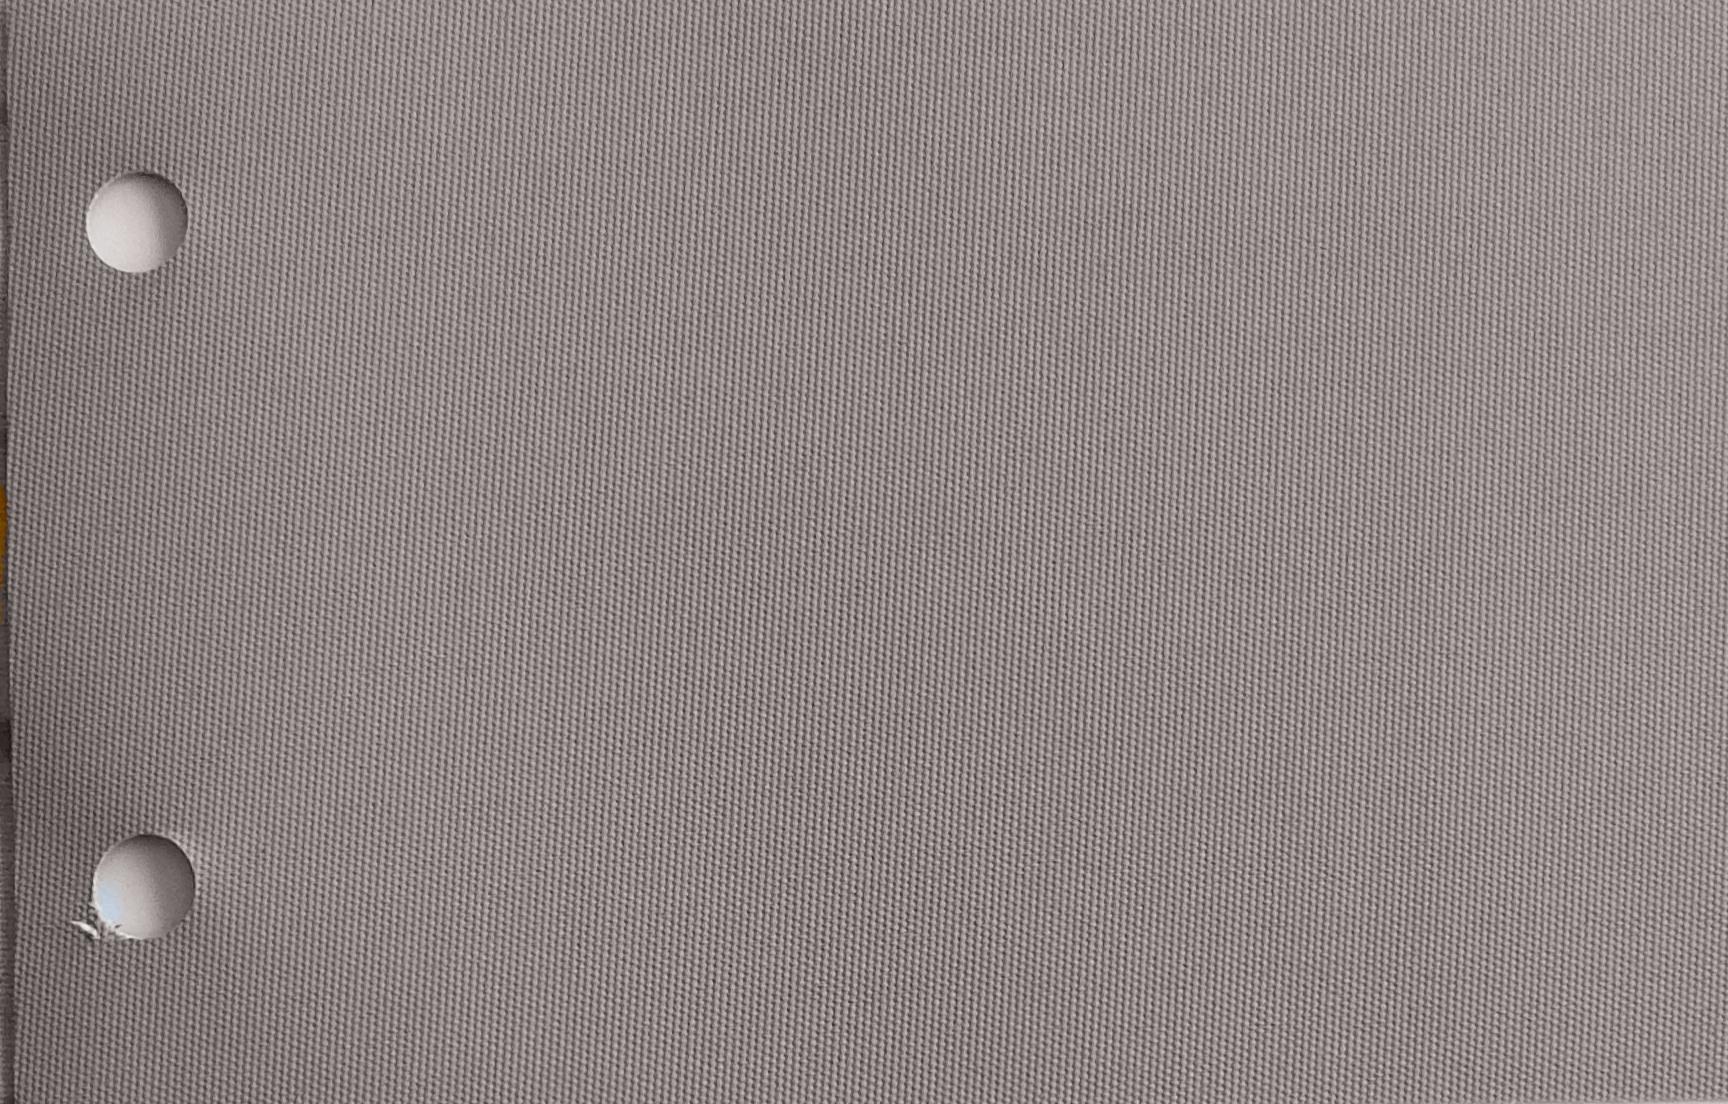 Vitra Flint blind fabric